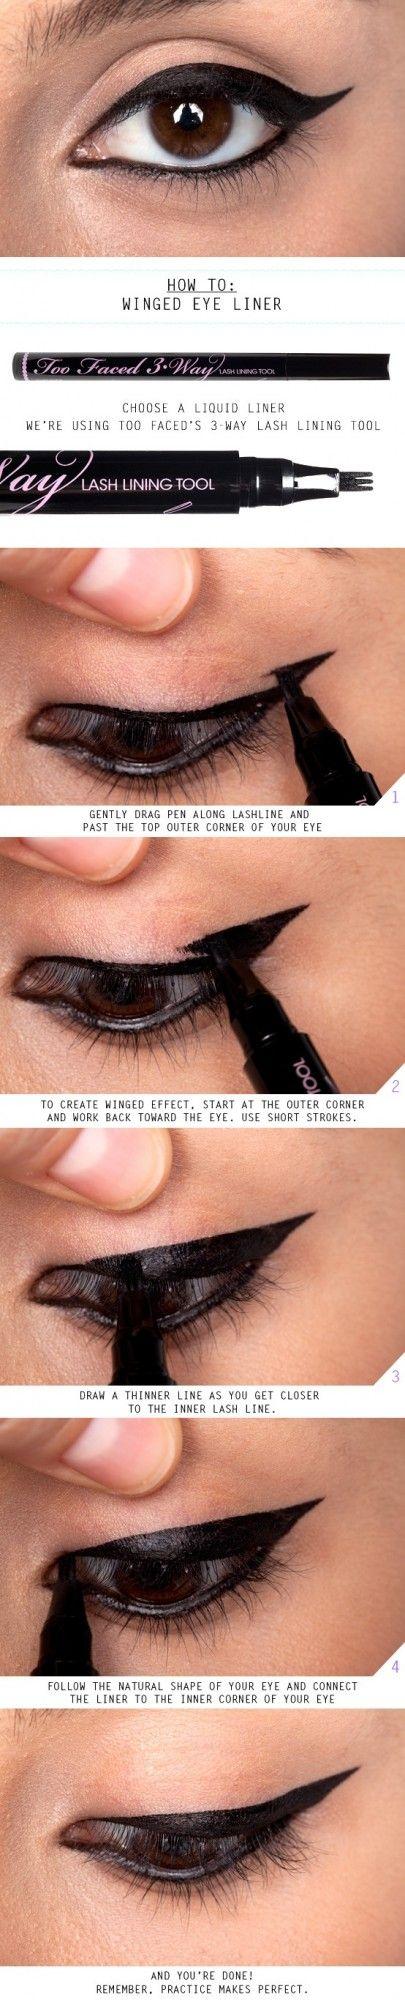 23 Great Makeup tutorials and tips